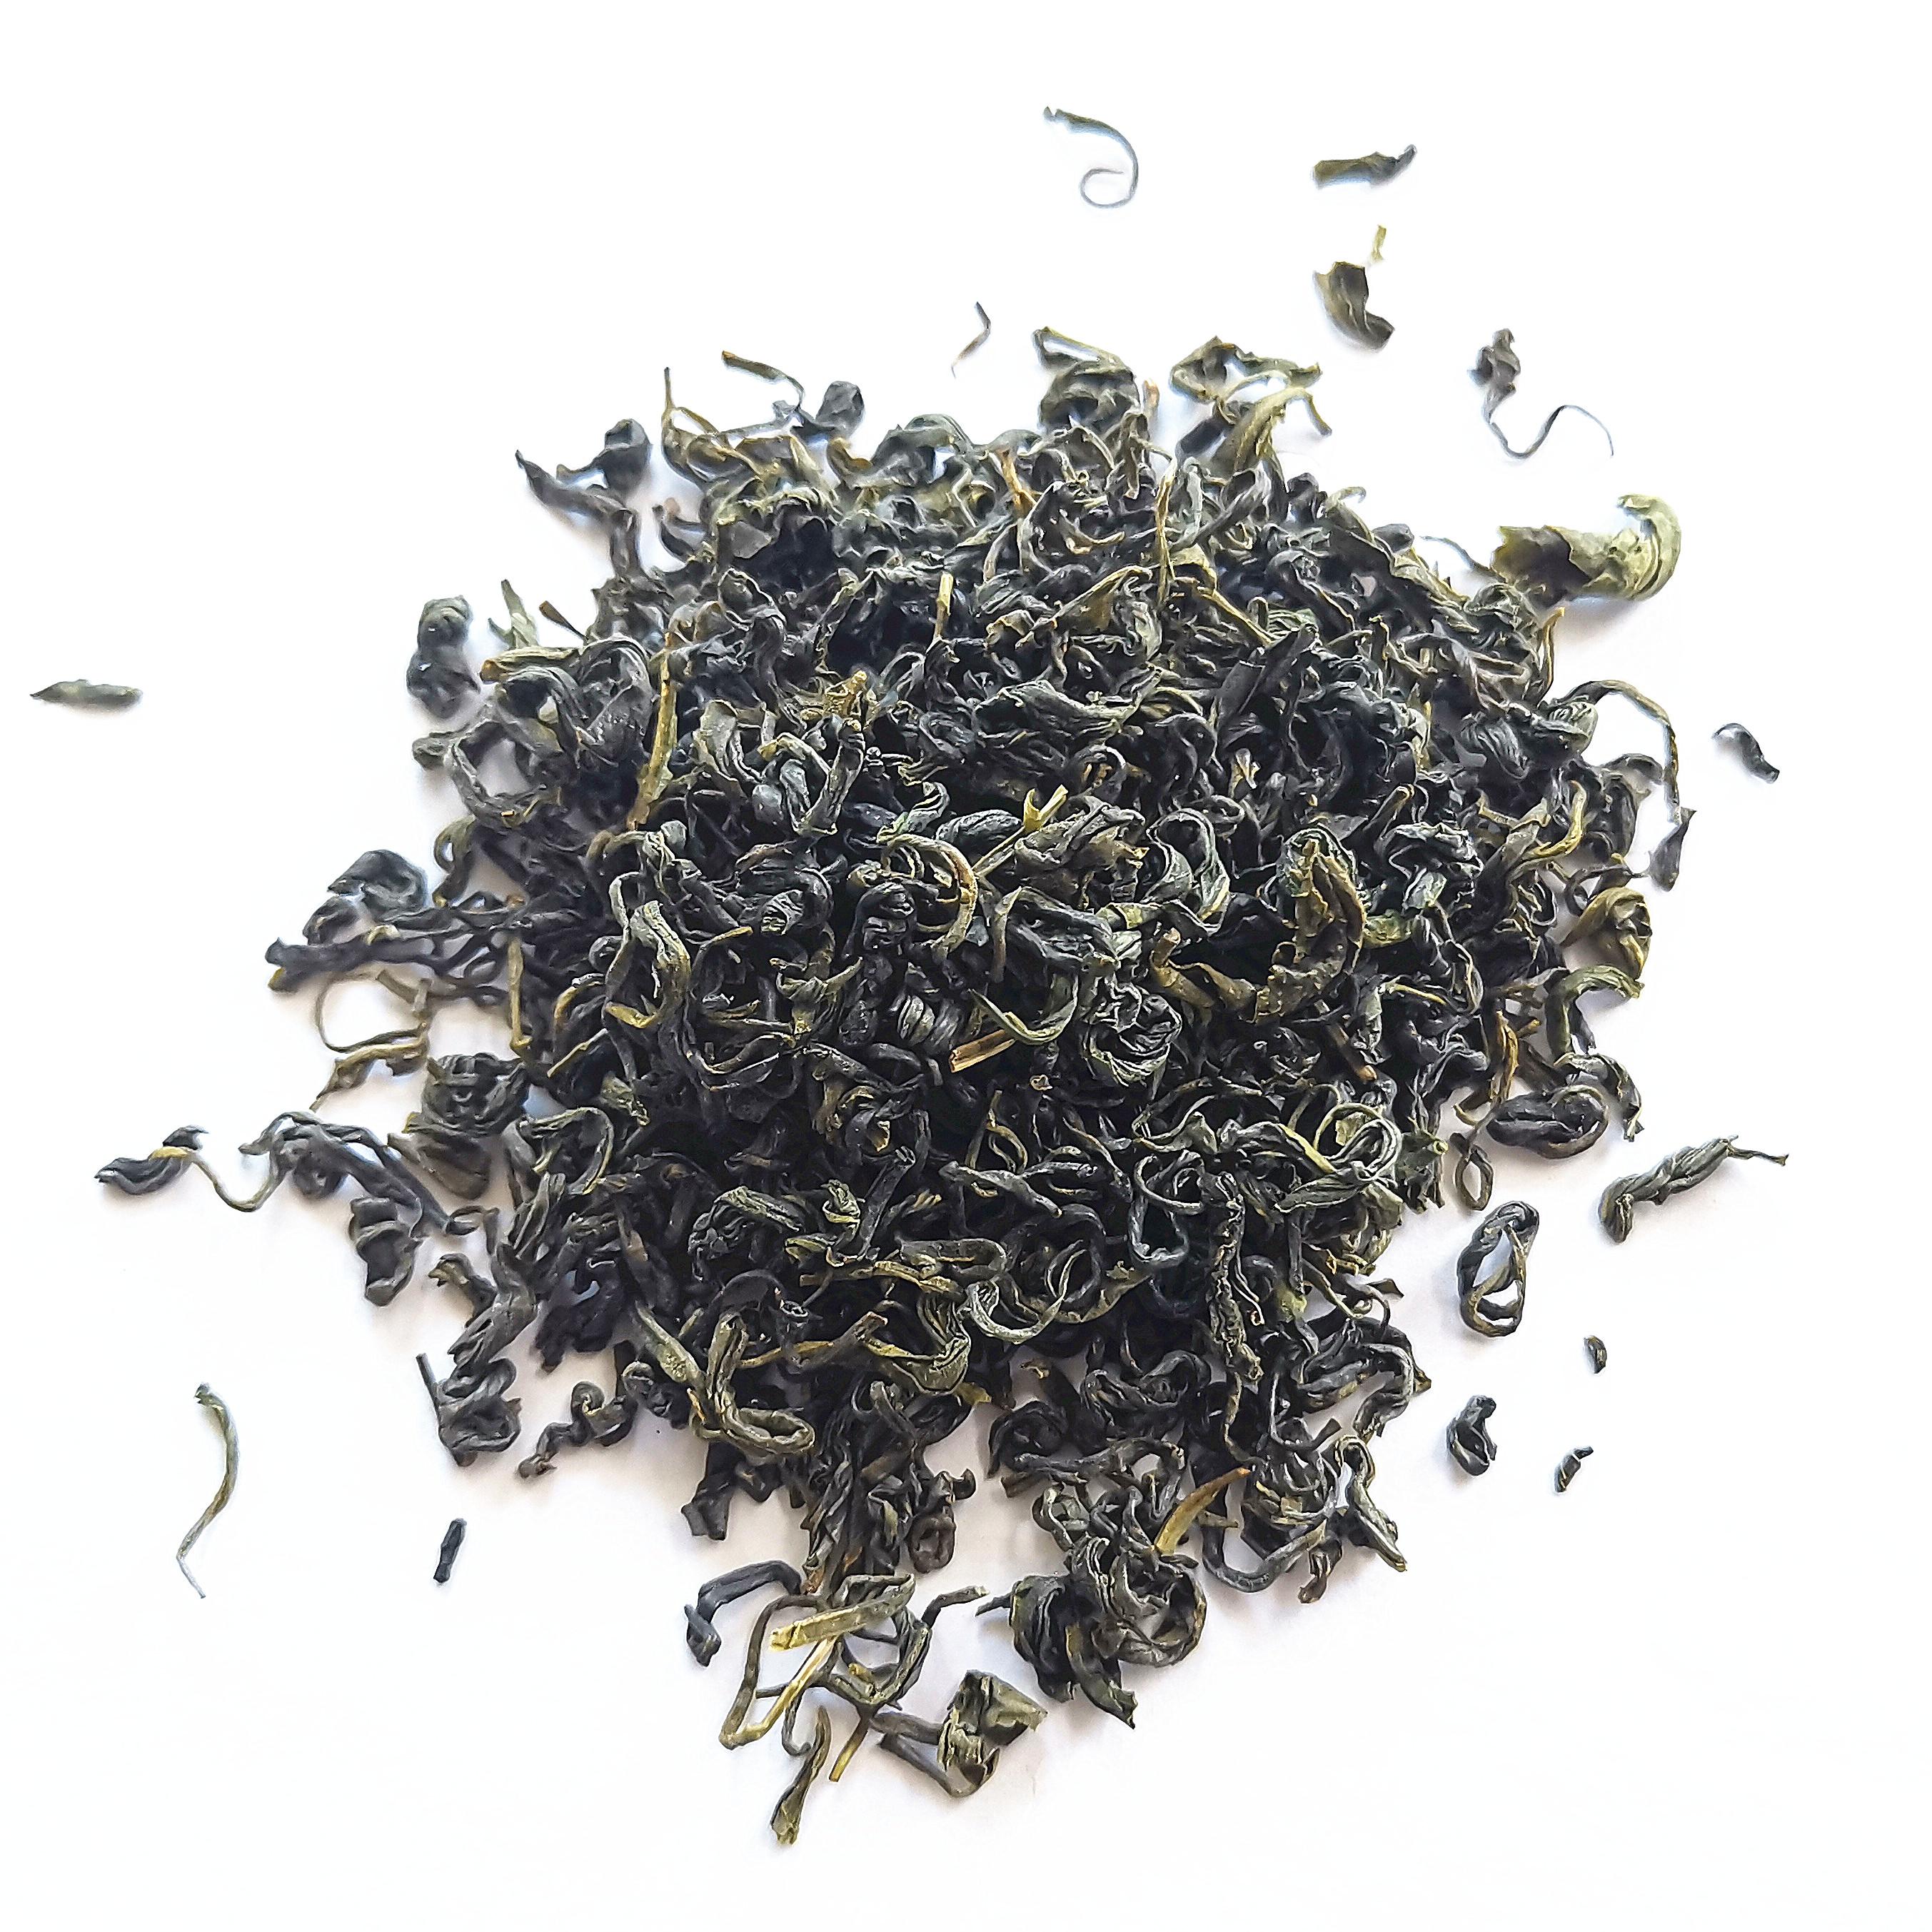 Loose leaf tea infuser leaf spring tea green - 4uTea | 4uTea.com